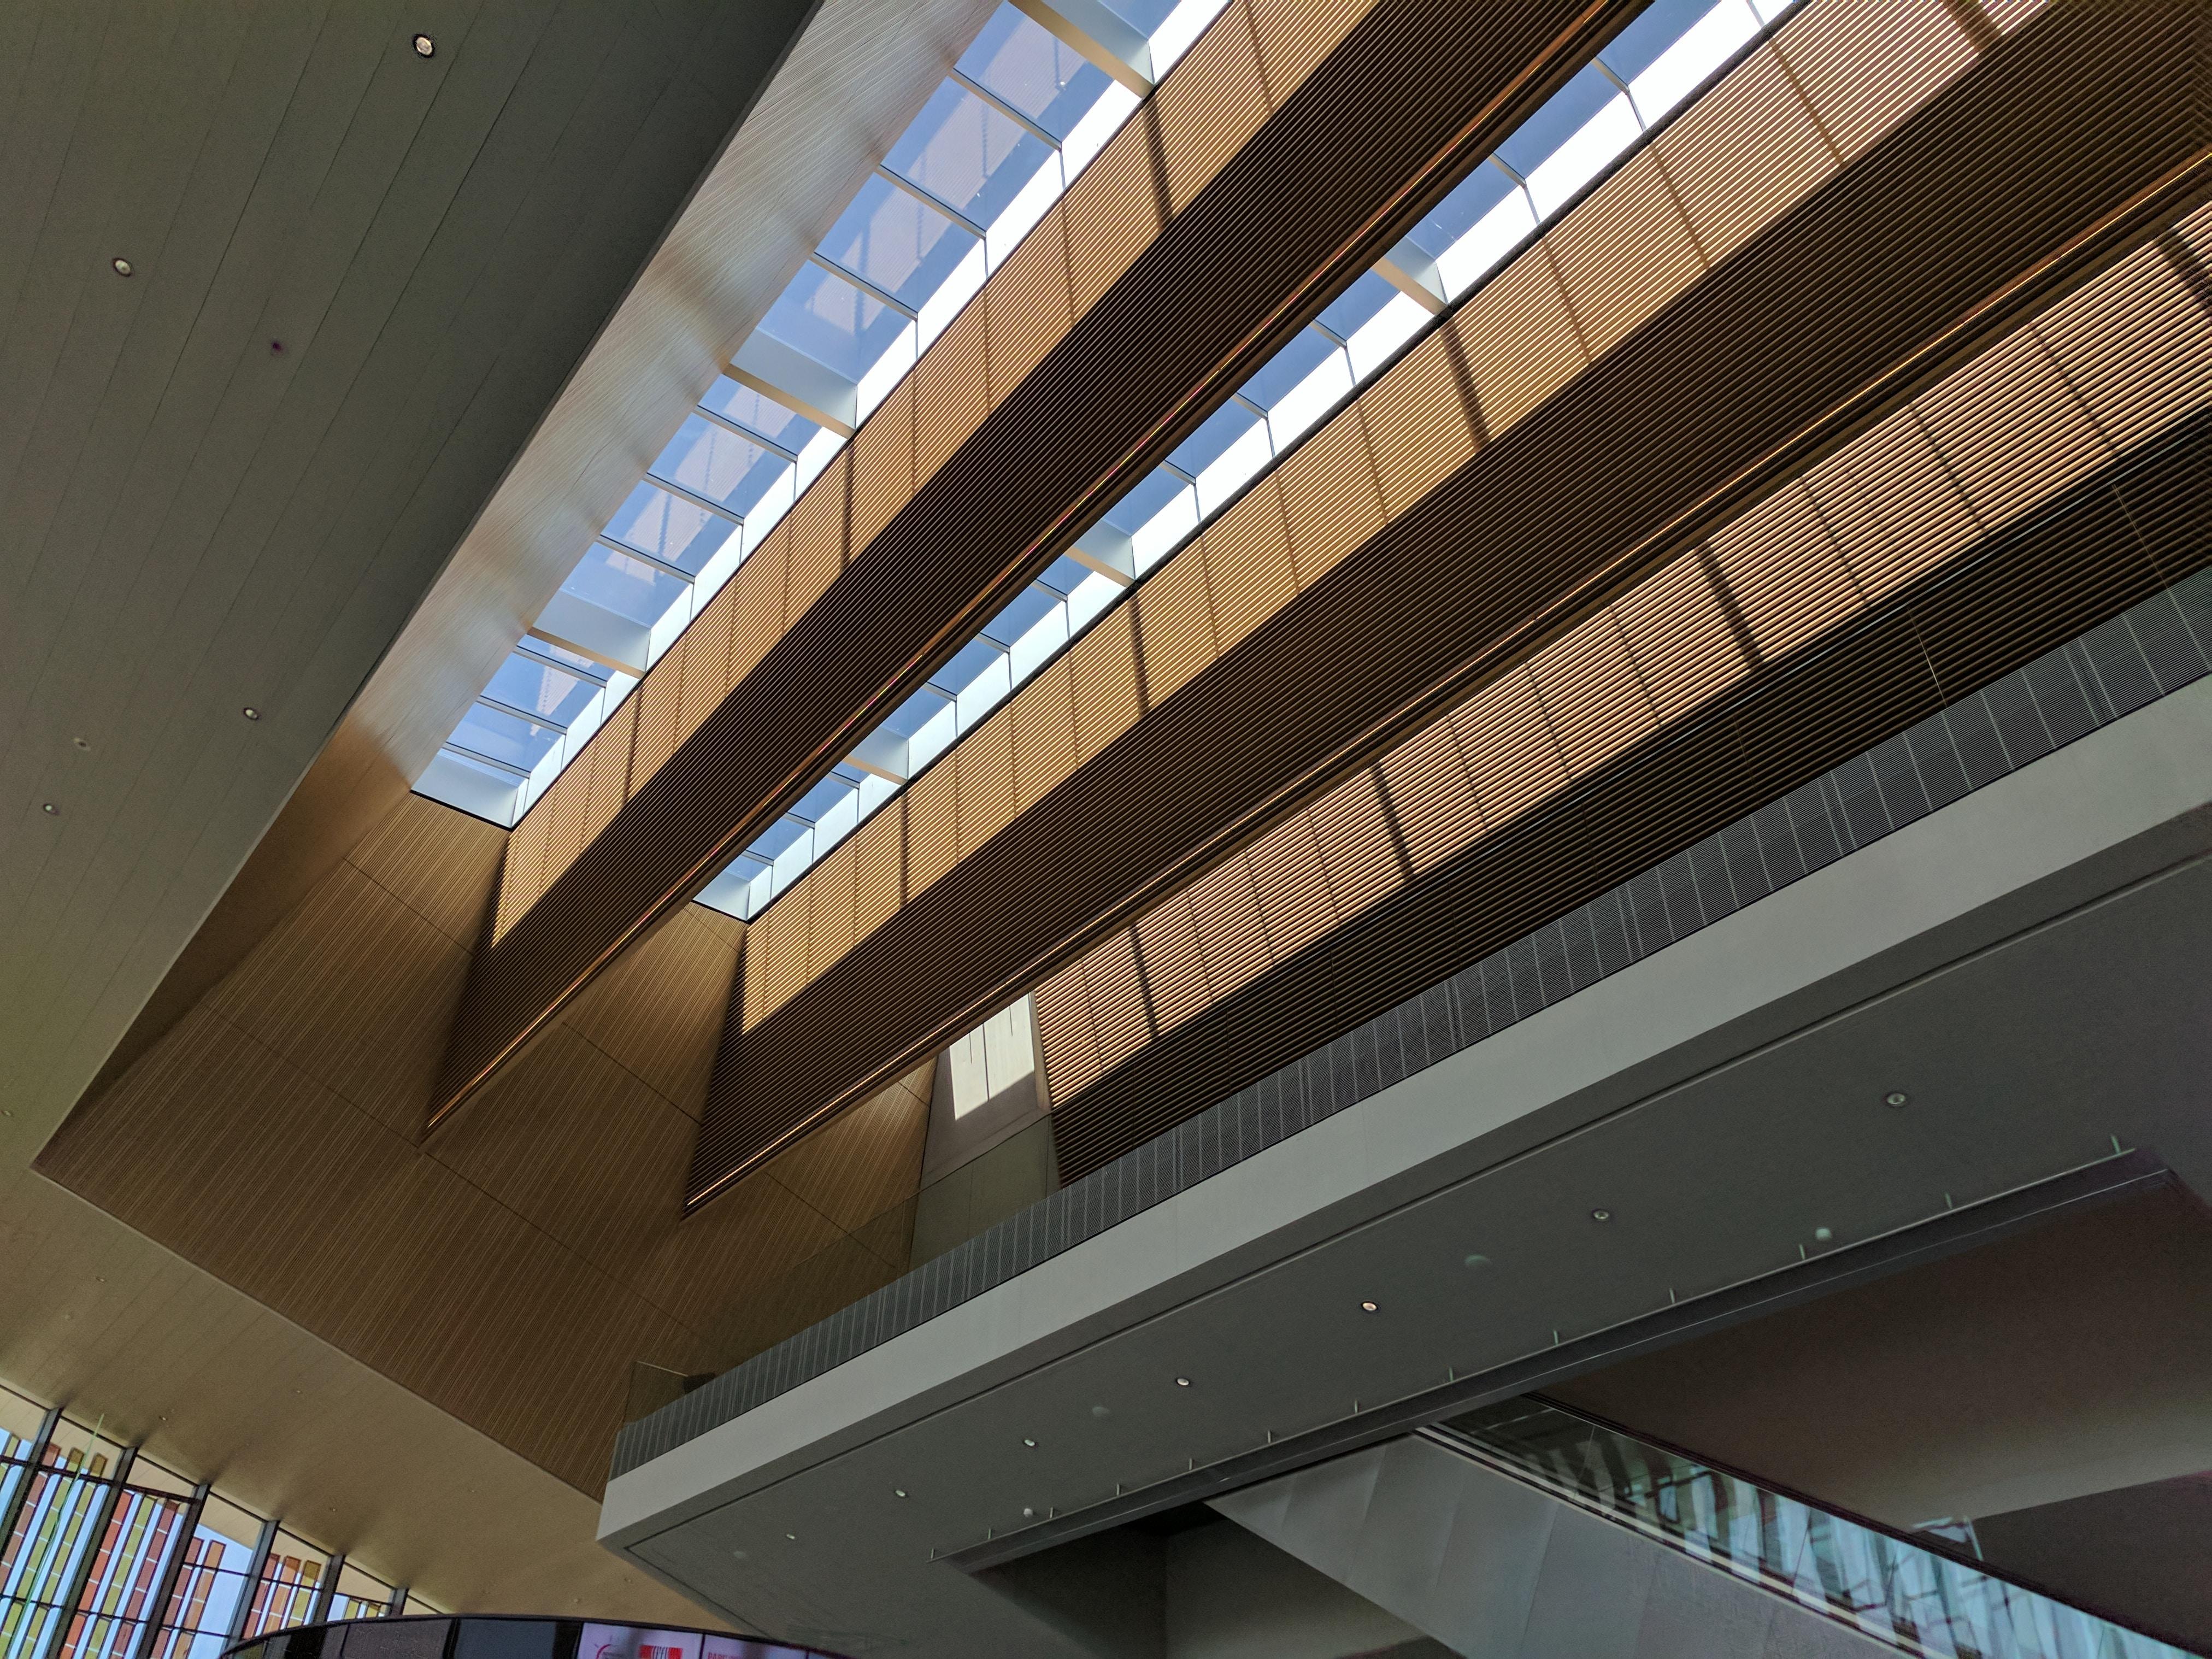 A modern roof in an atrium in Lausanne, Switzerland